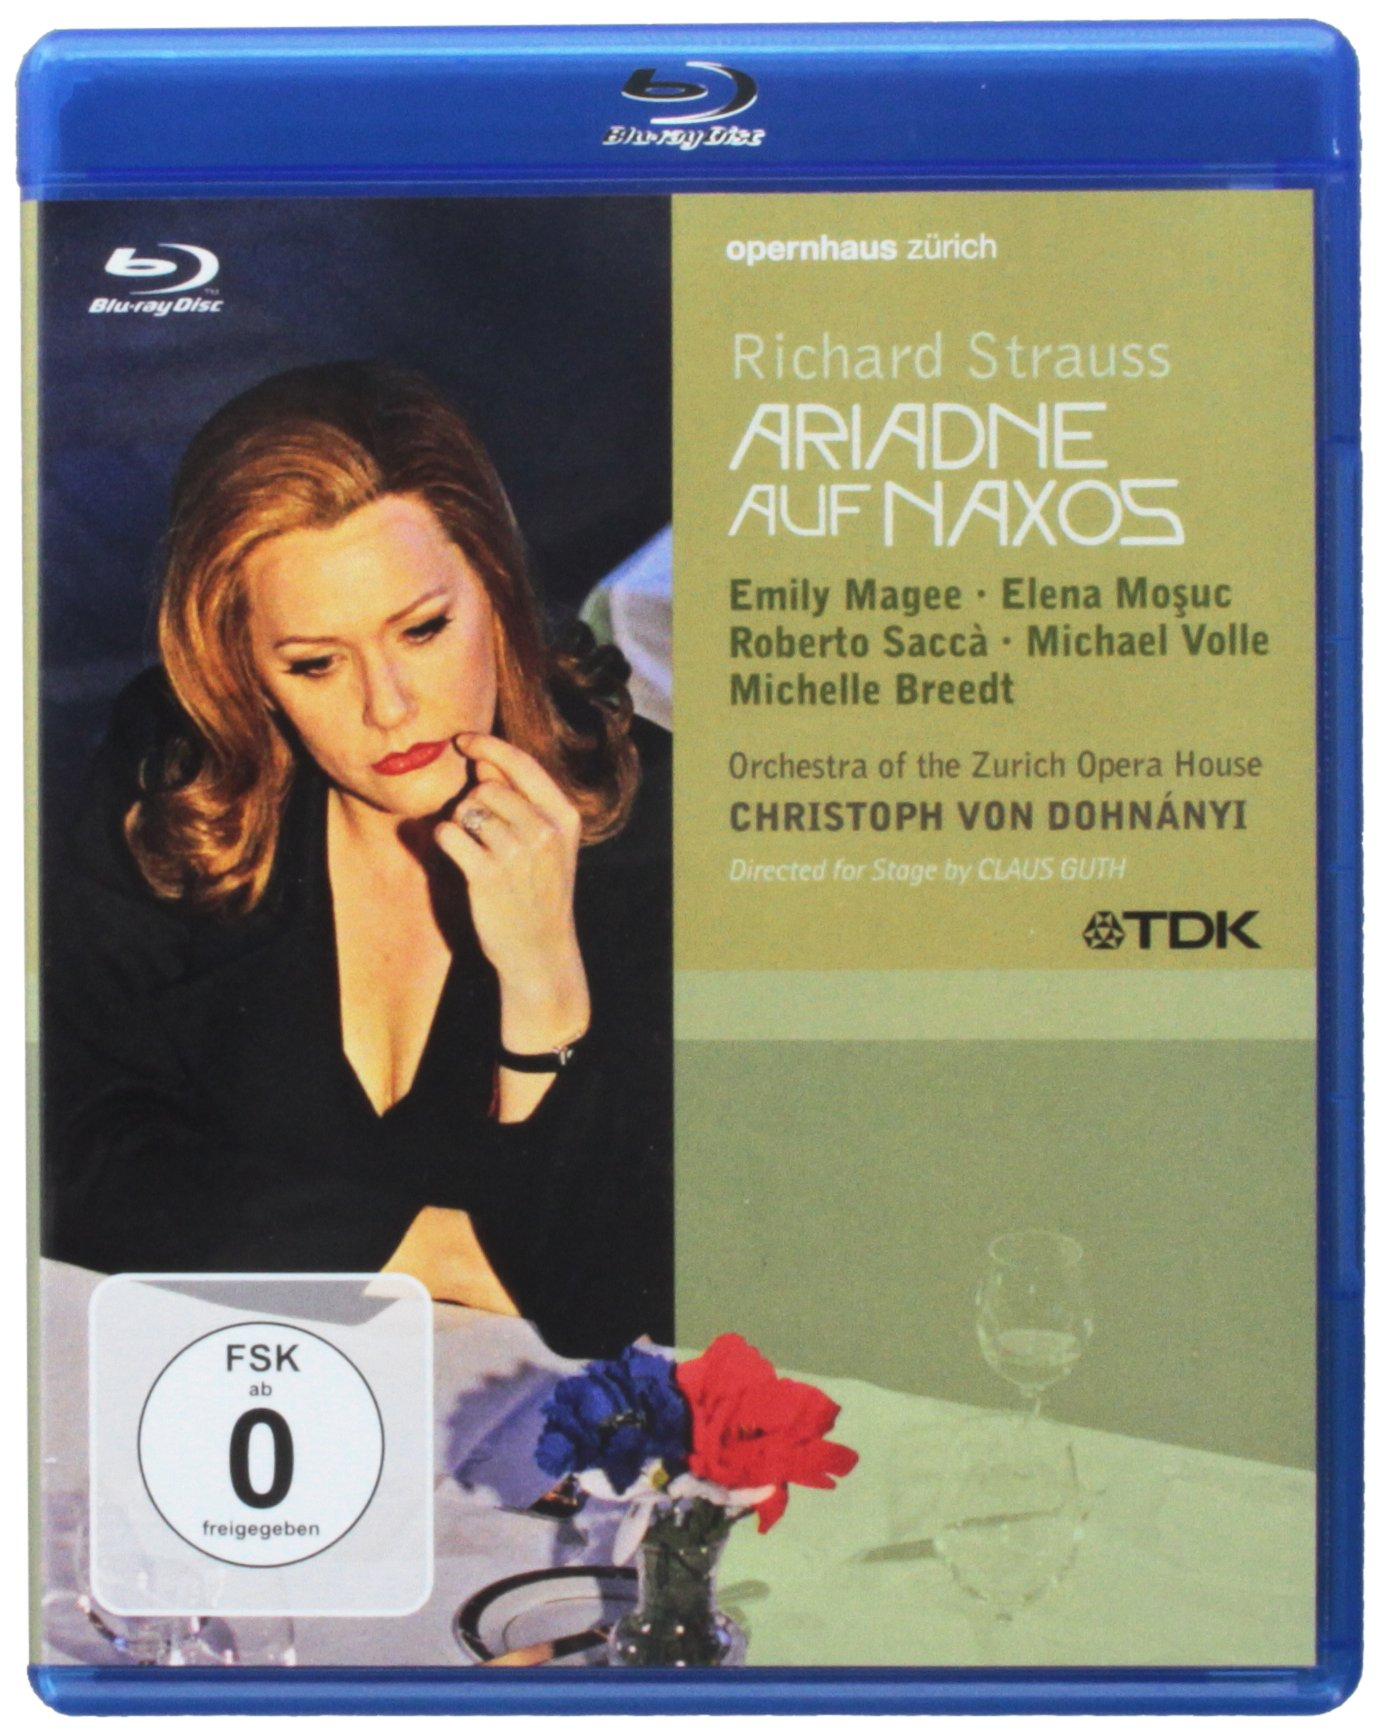 Alexander Pereira - Ariadne Auf Naxos (Widescreen, Subtitled)